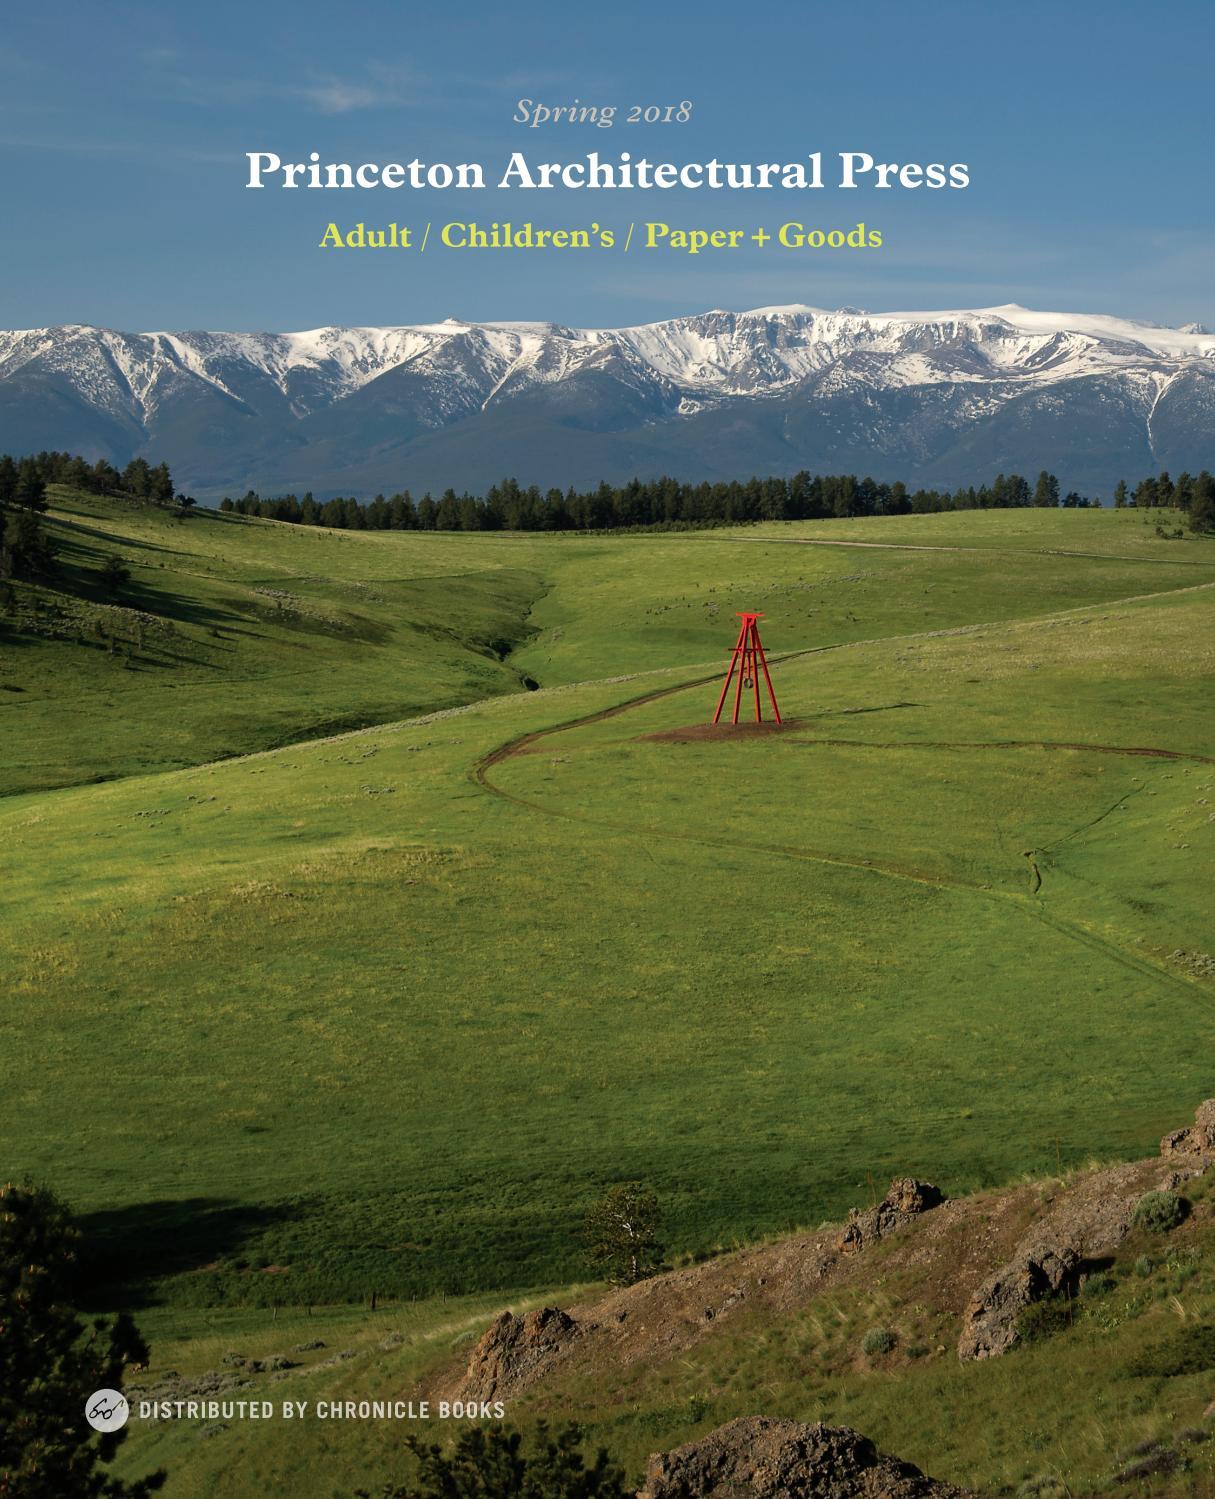 15cd0c3071ff9 Princeton Architectural Press Spring 2018 Catalog by Princeton ...